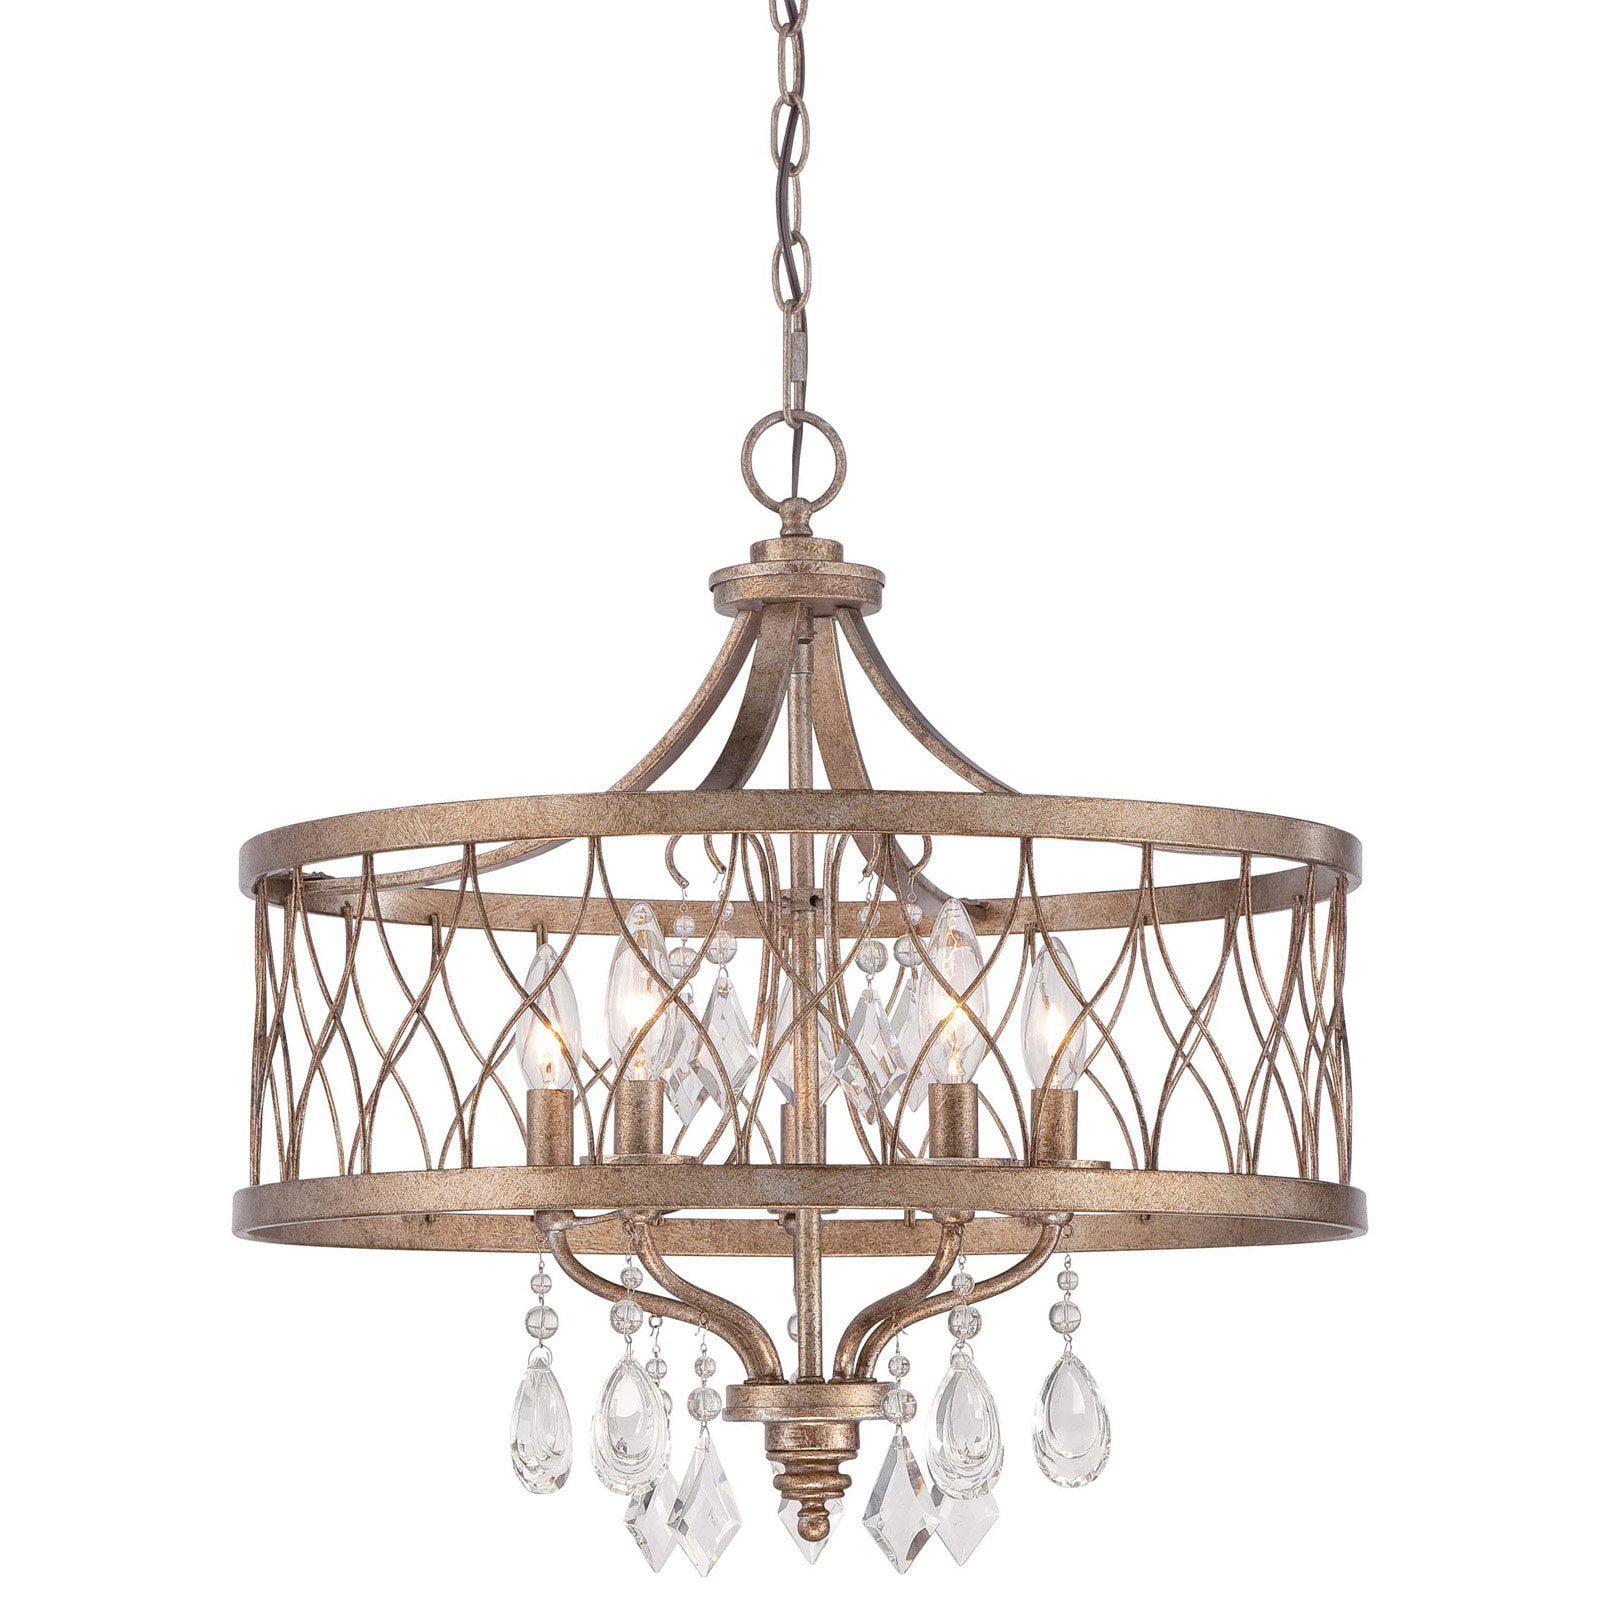 Minka Lavery West Liberty 5 Light Chandelier - Olympus Gold